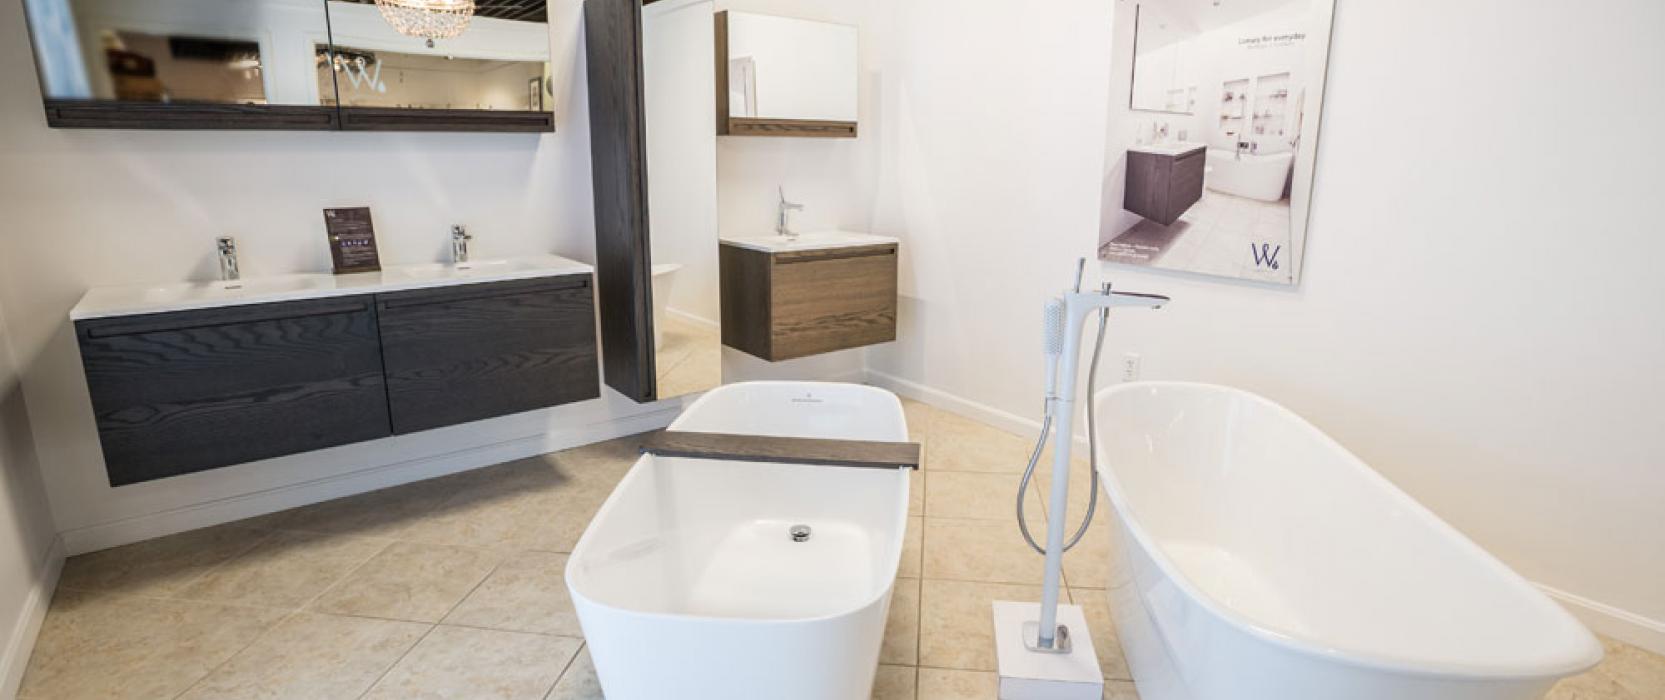 Frank Webb's Bath & Lighting Center: WETSTYLE New Display Showroom